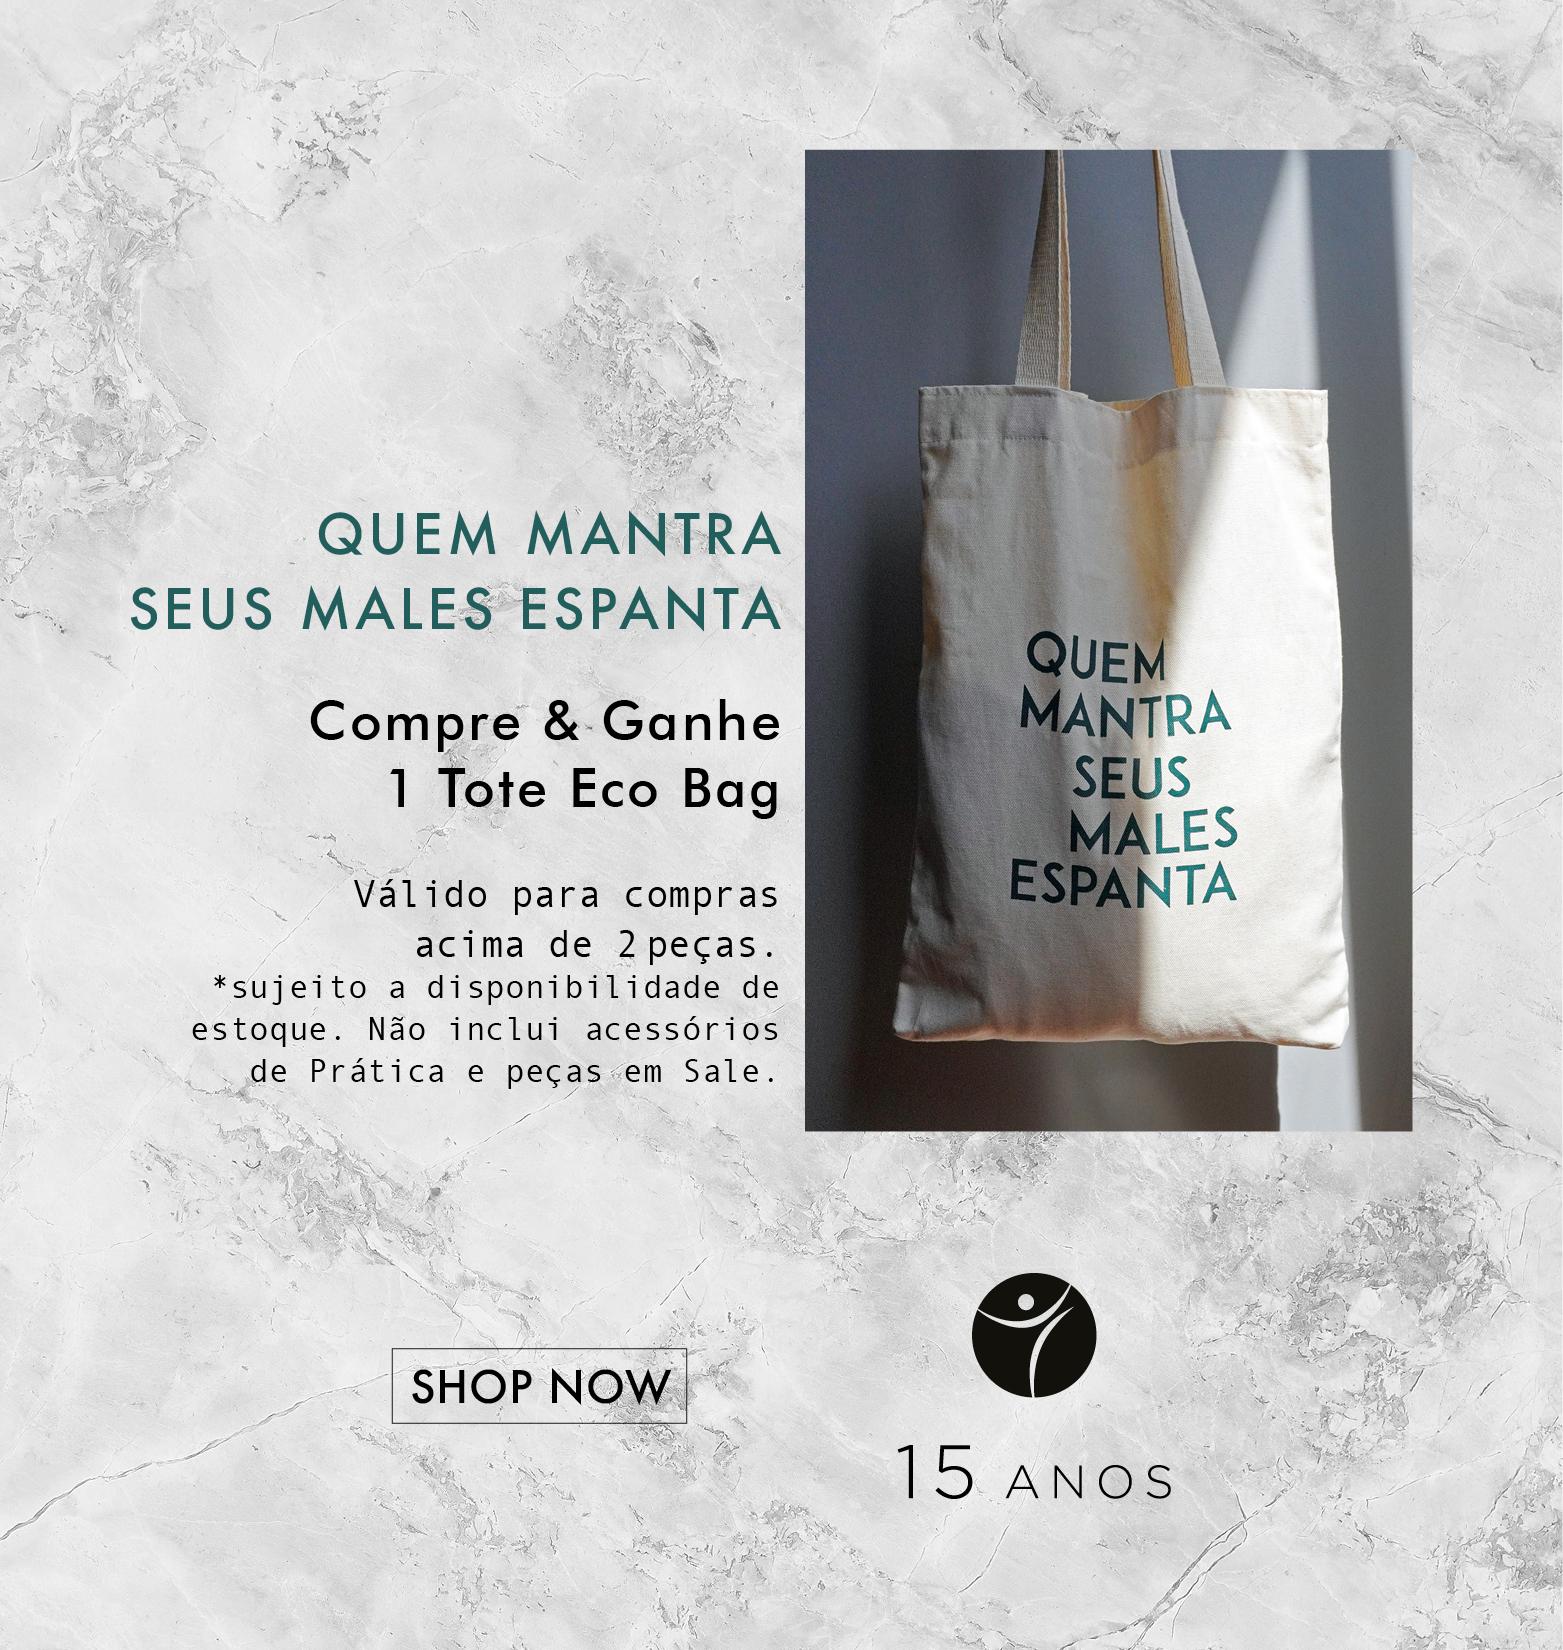 Mobile - 01/07 - Promocao Tote Bag